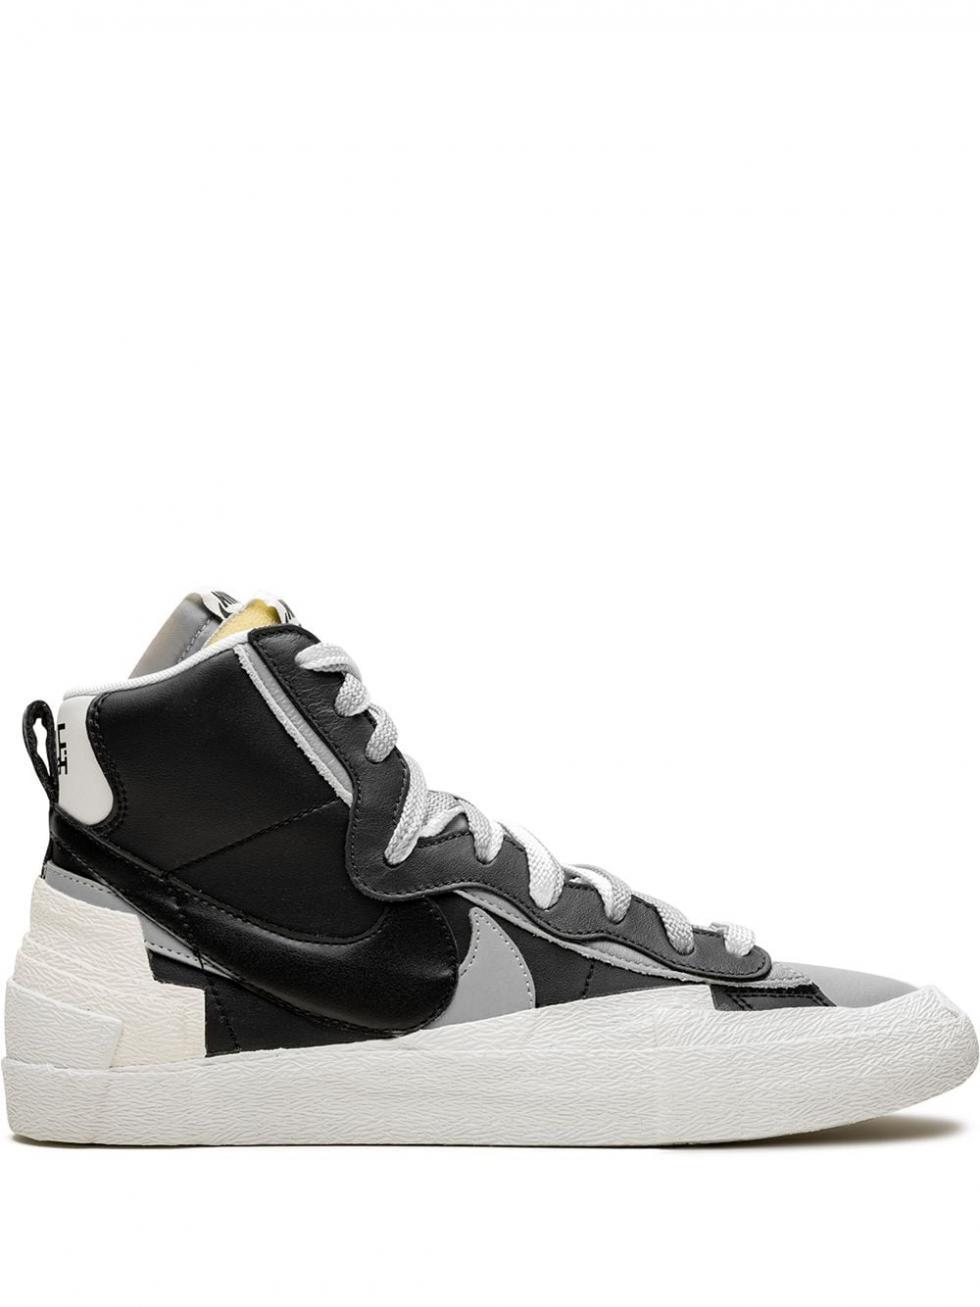 Femme Baskets Montantes Sacai X Nike Blazer Mid Black/Wolf Grey-White | Baskets Nike - Angelic Claws